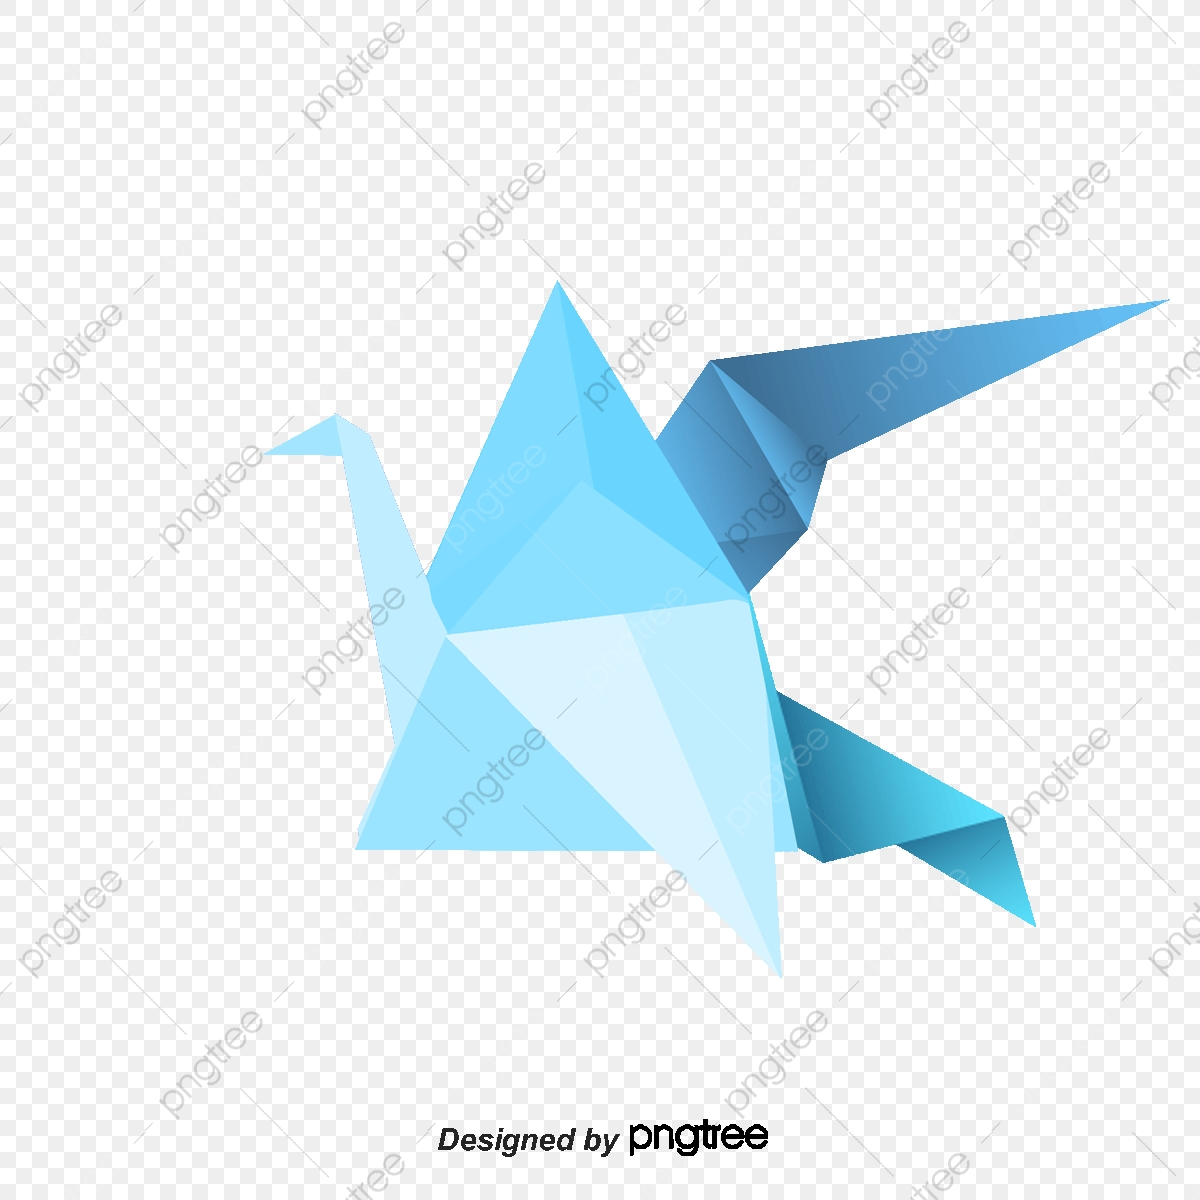 https://png.pngtree.com/png-clipart/20190604/original/pngtree-origami-birds-vector-png-image_916979.jpg